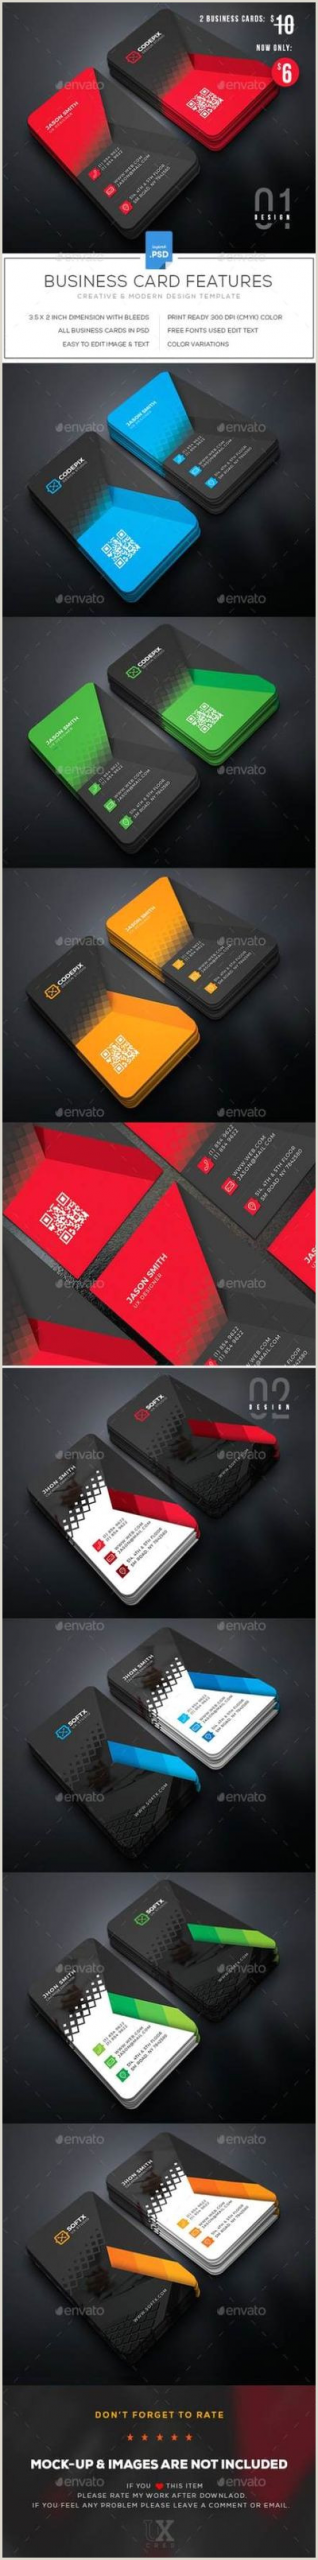 Modern Business Card Layout Creative Modern Polygon Business Card